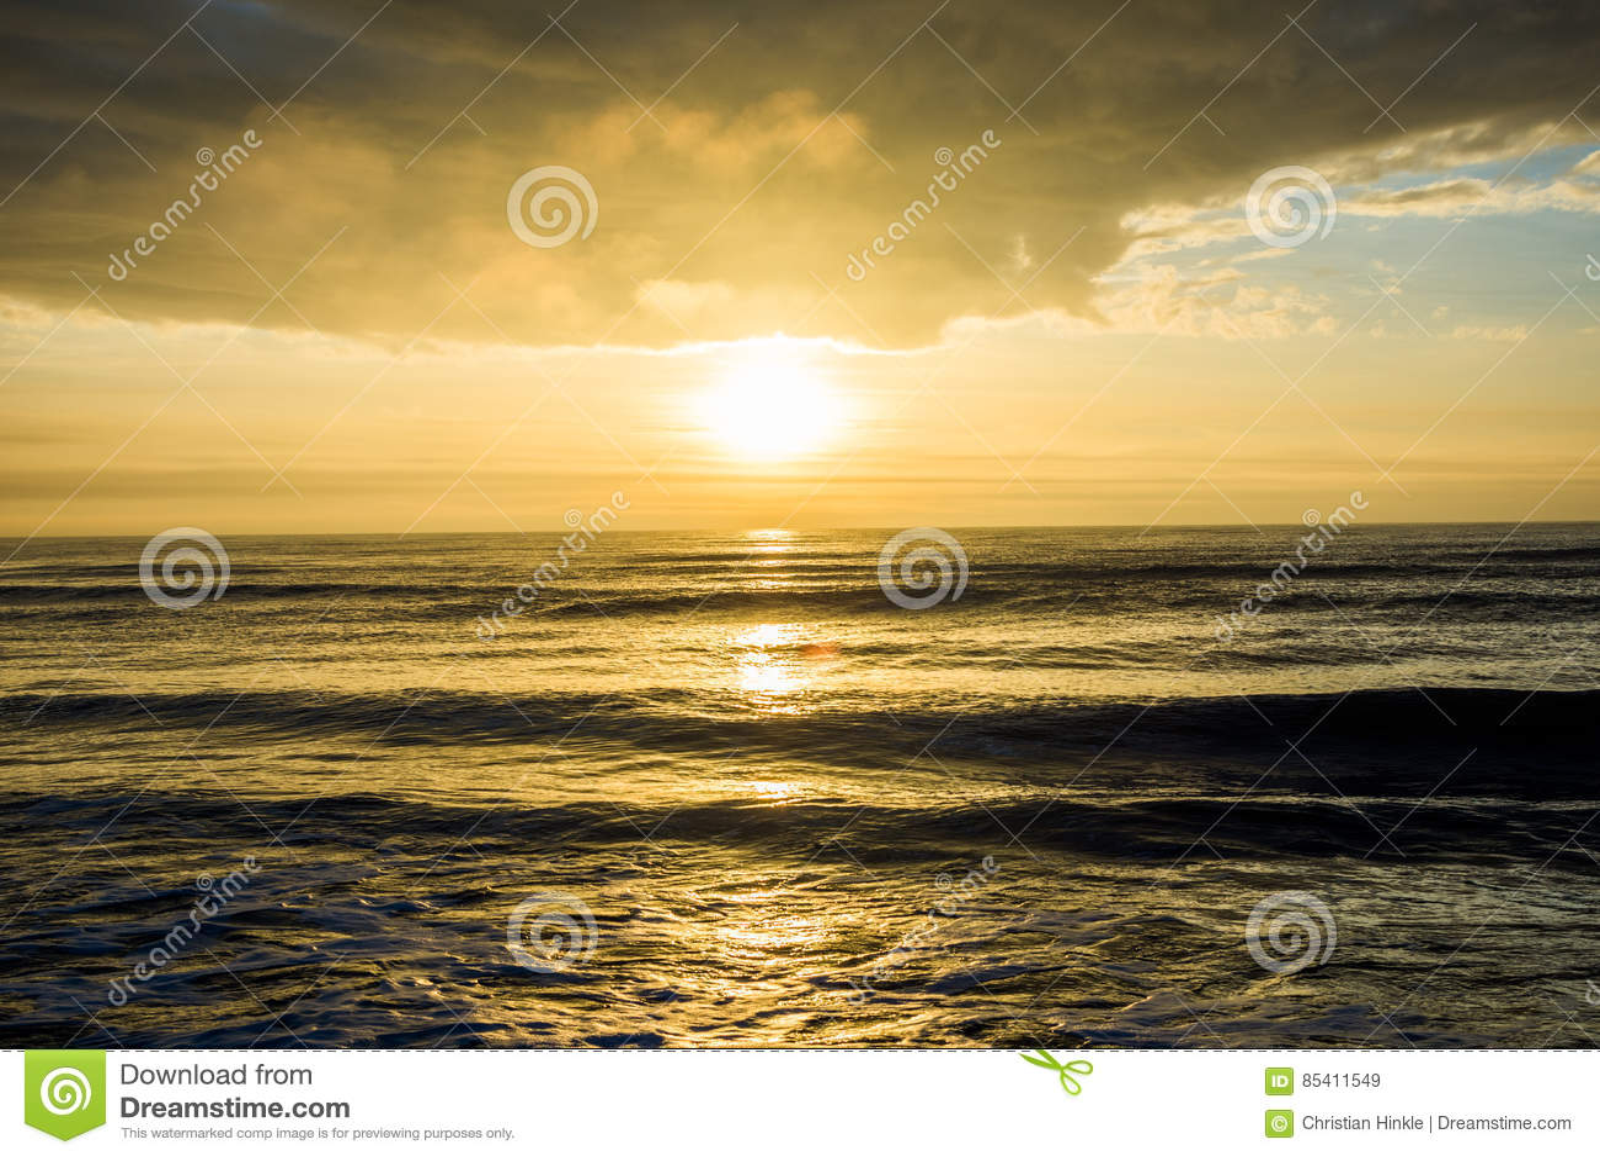 Sonnenaufgang an der Insel des Palmen-Strandes, über dem Ozean in South Carolina